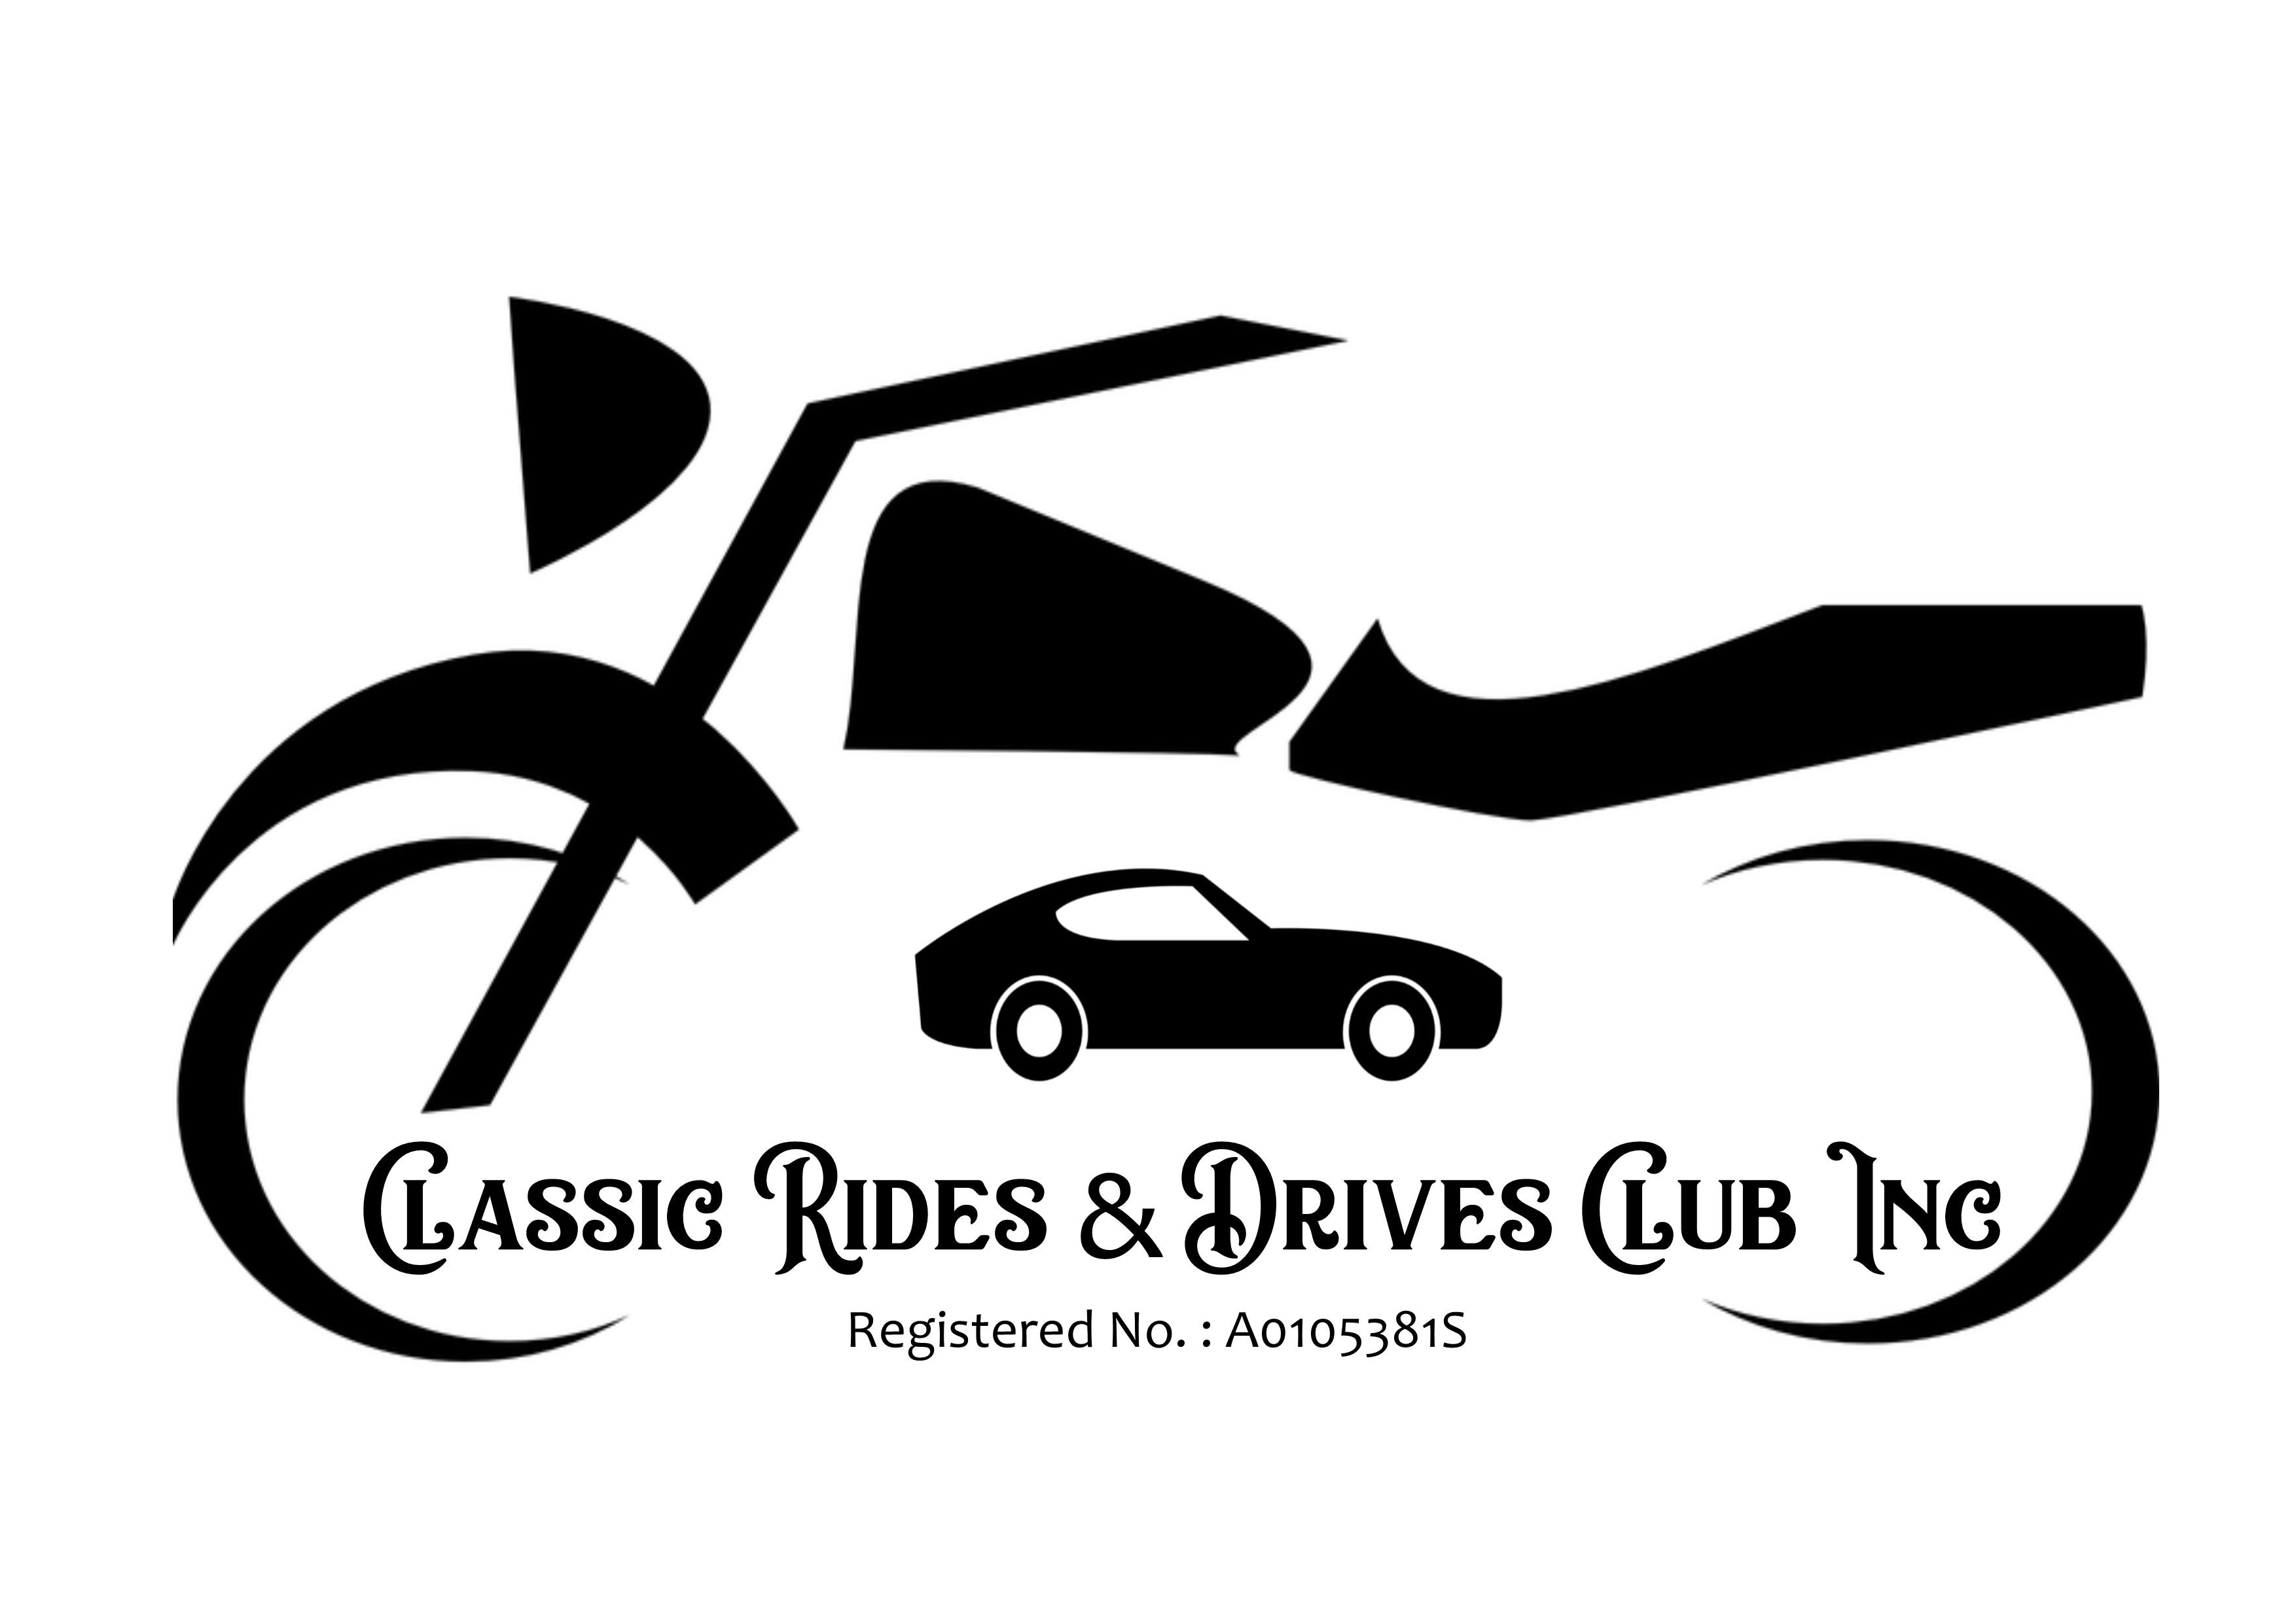 Classic Rides Amp Drive Club Inc